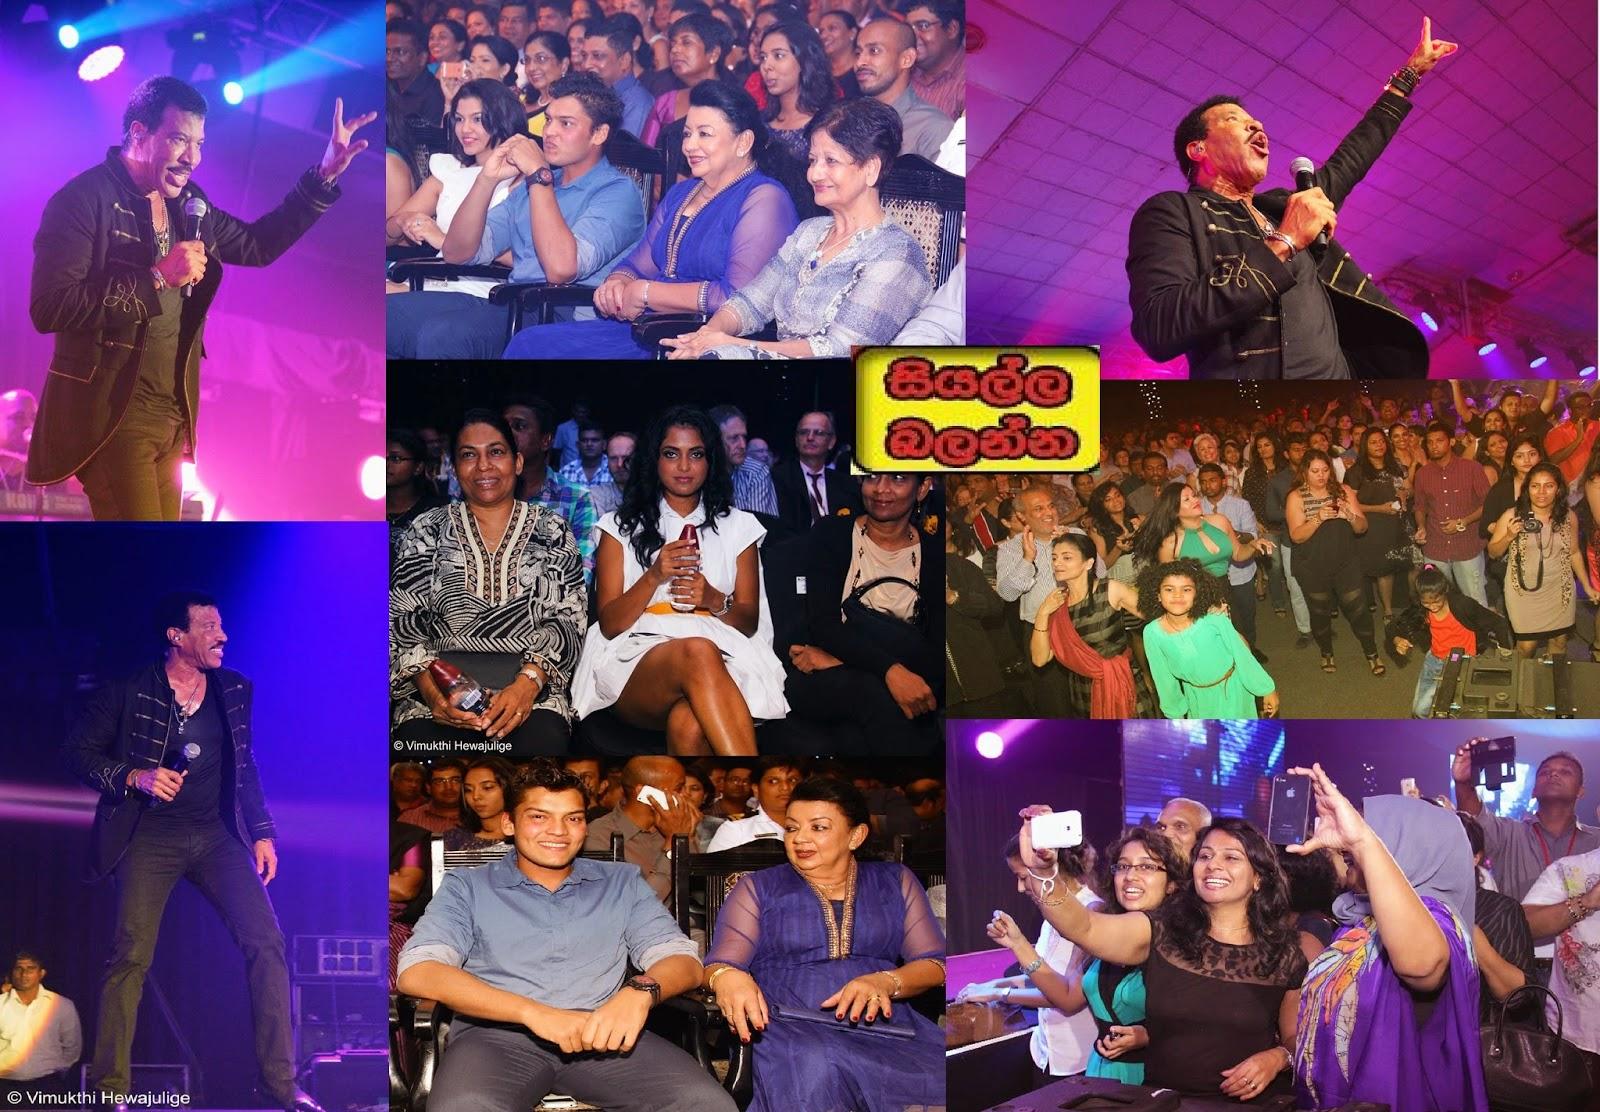 http://picture.gossiplankahotnews.com/2014/10/lionel-richie-live-in-sri-lanka.html